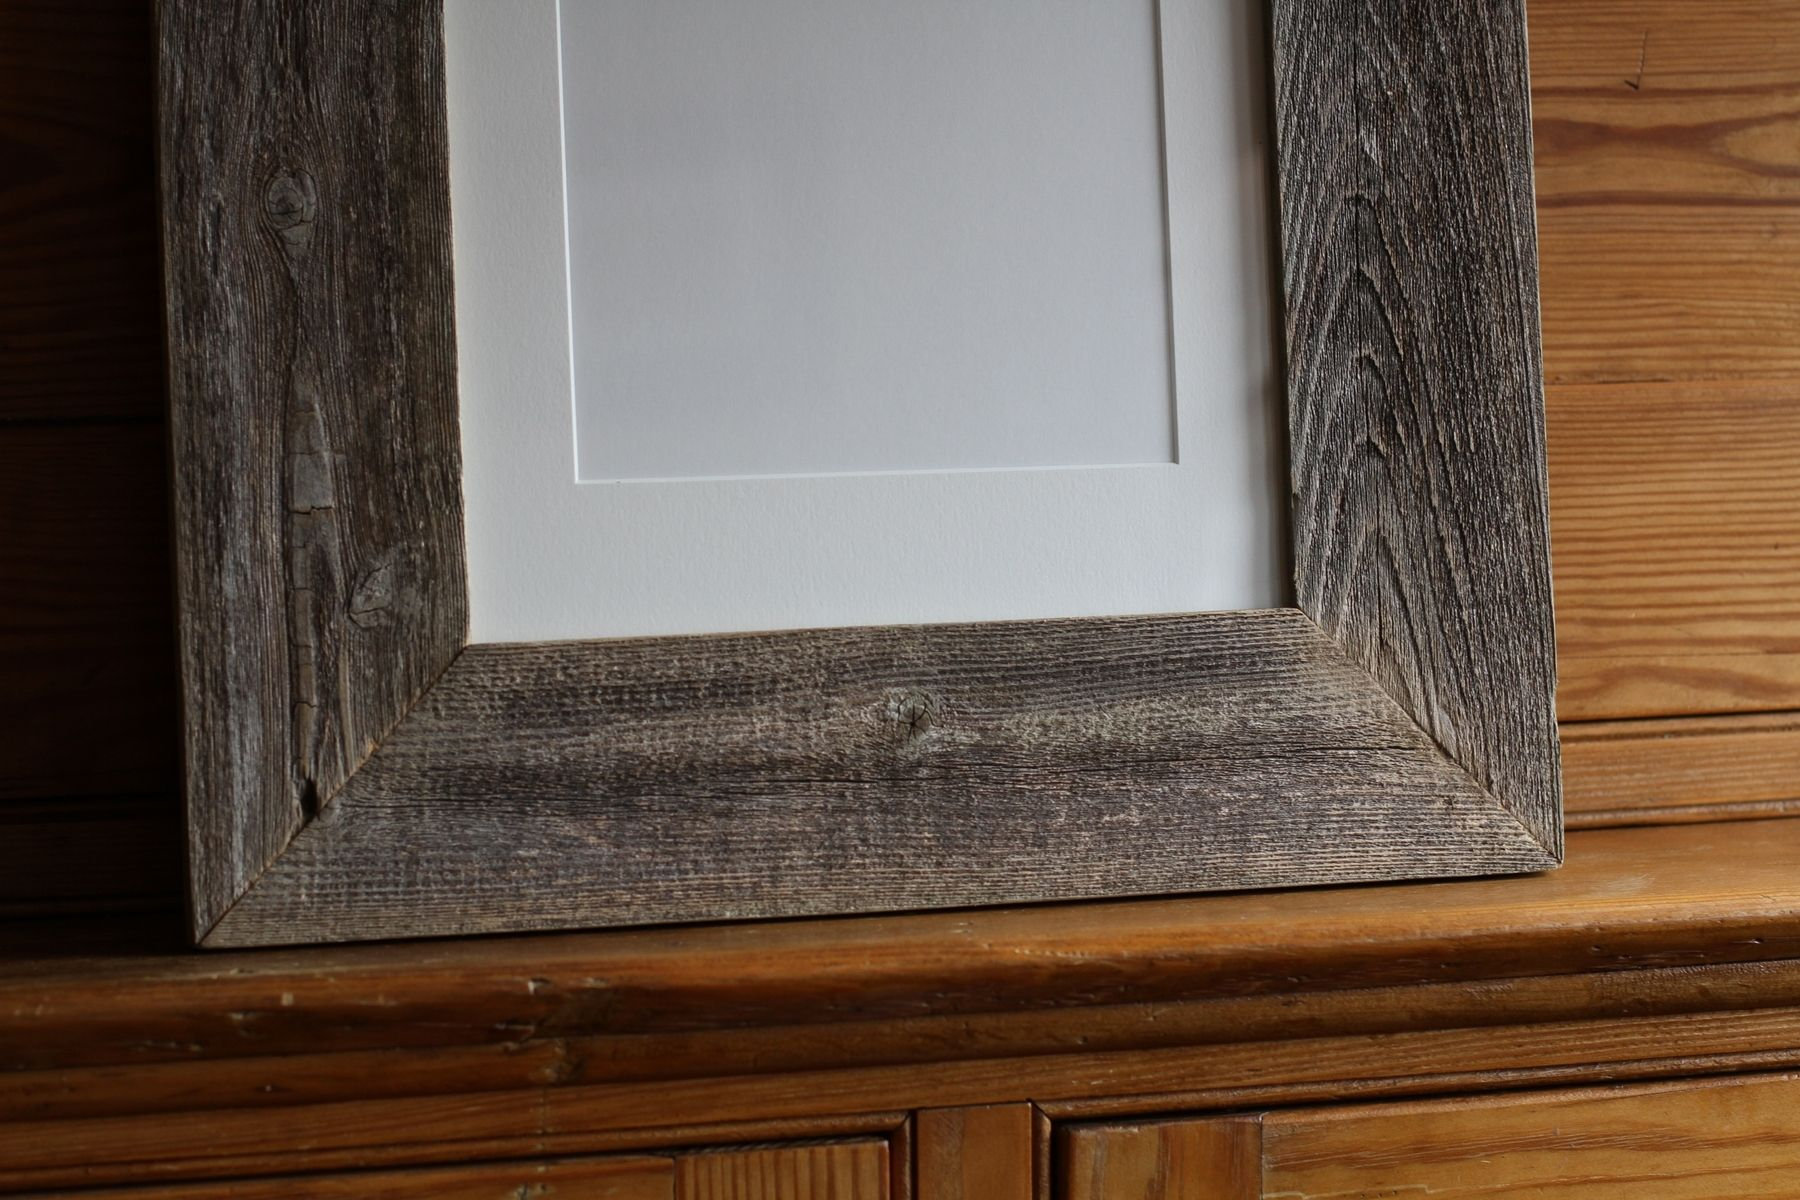 Handmade custom made 11x14 reclaimed cedar frame by reclaimed llc custom made custom made 11x14 reclaimed cedar frame jeuxipadfo Images